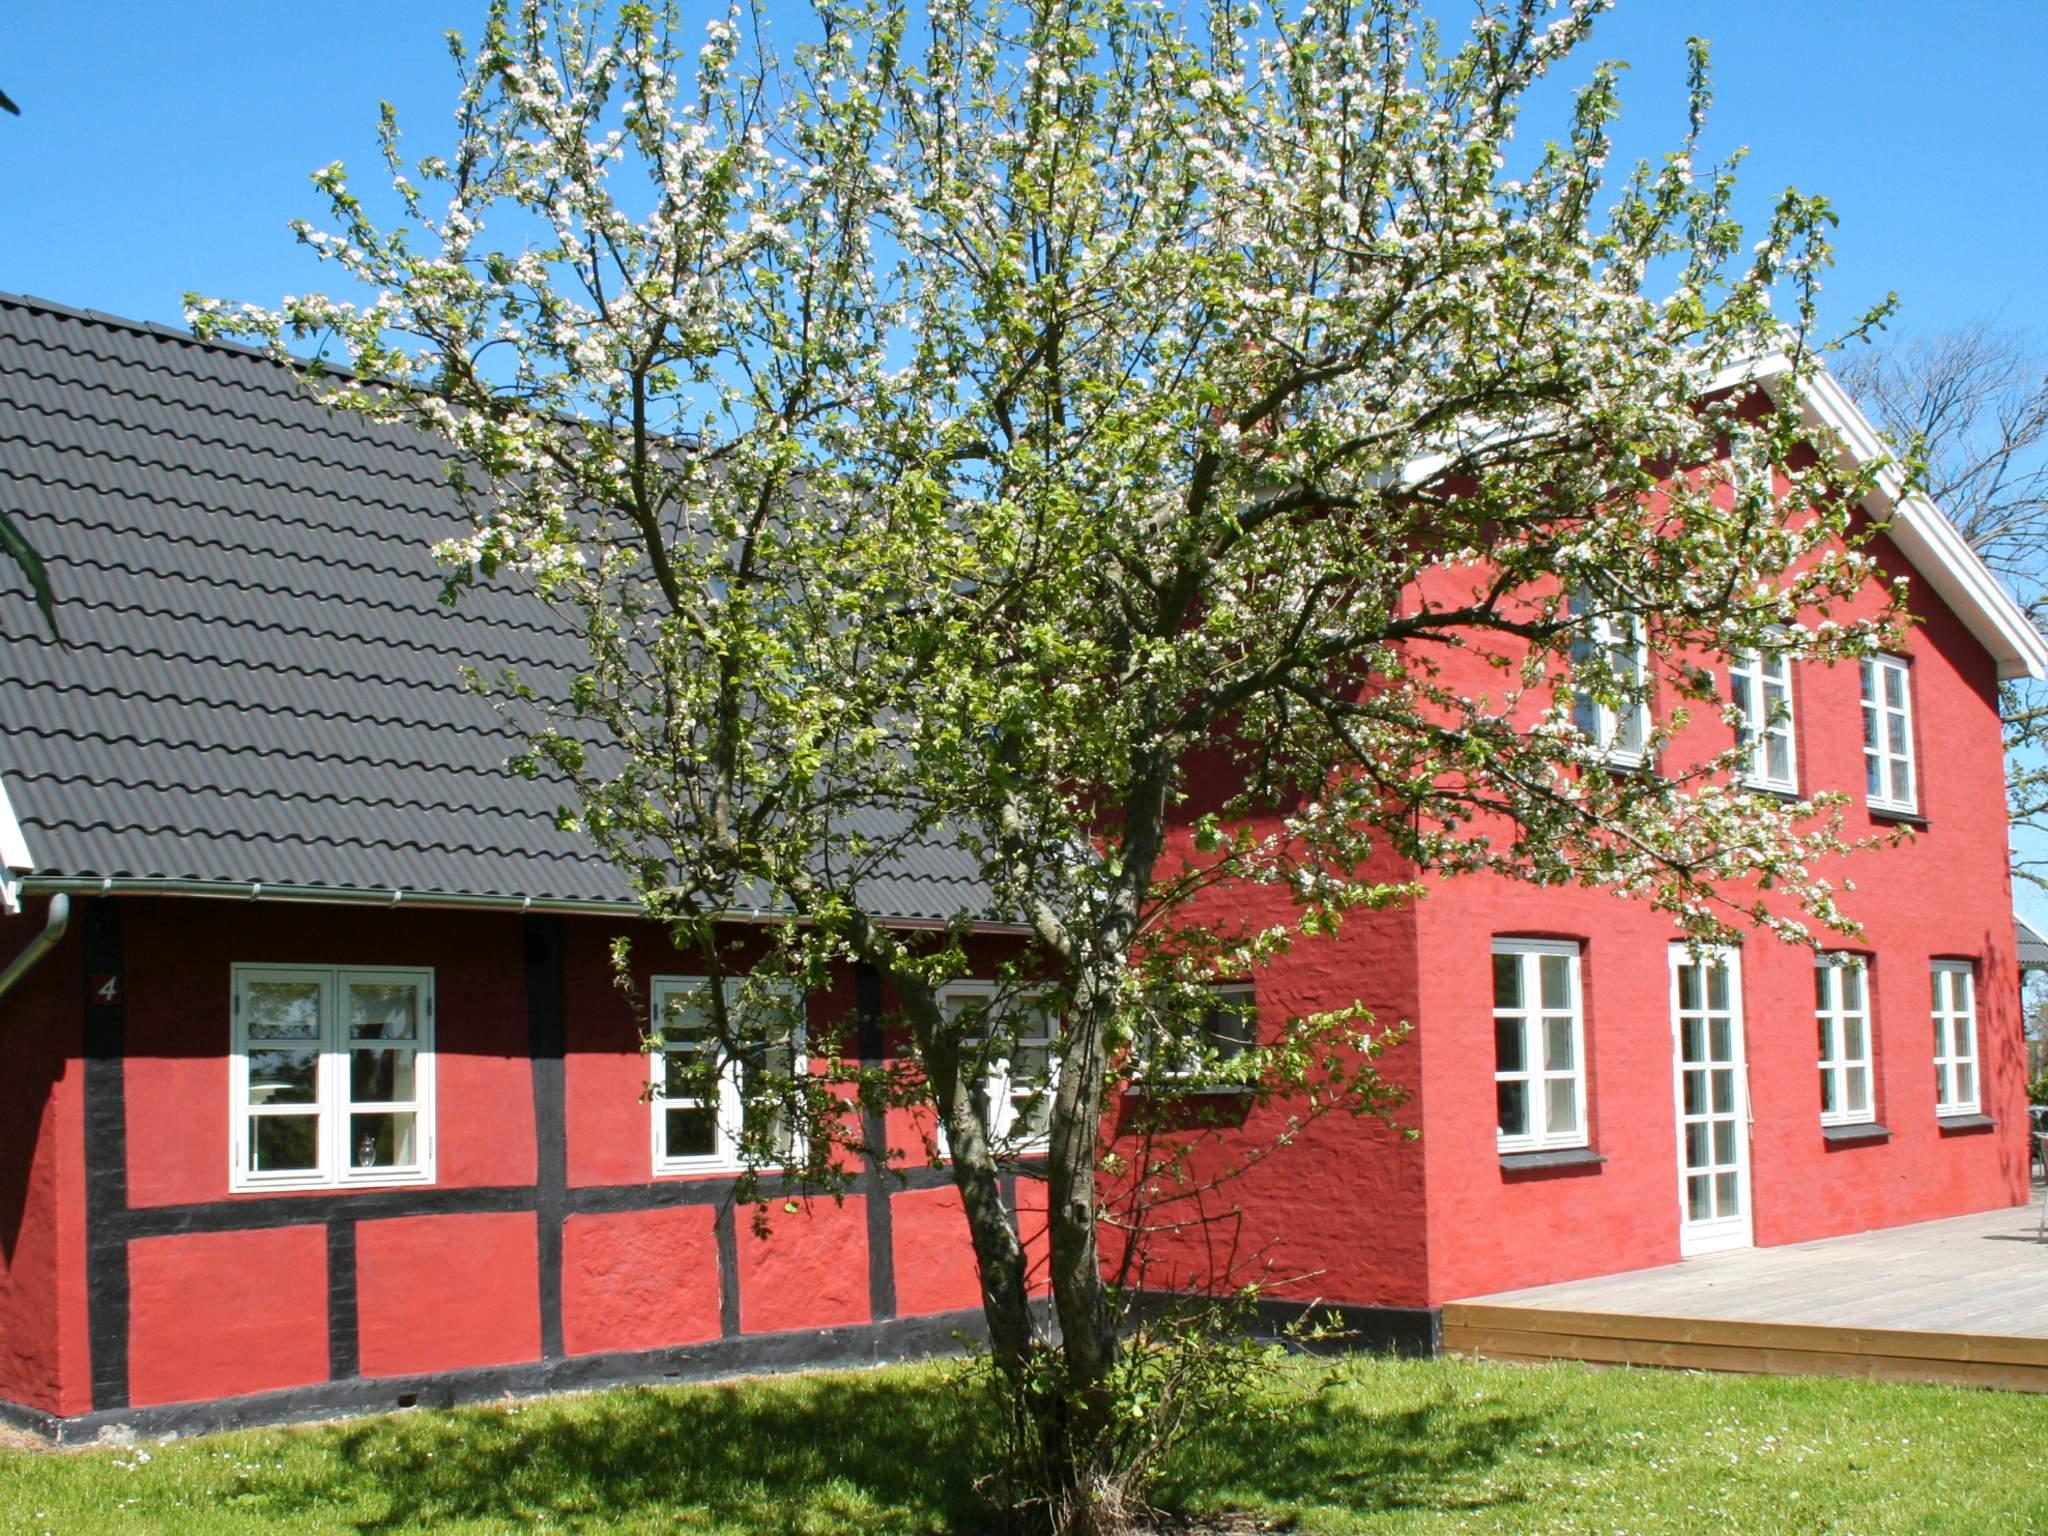 Ferienhaus Balka Strand (250432), Balke, , Bornholm, Dänemark, Bild 26